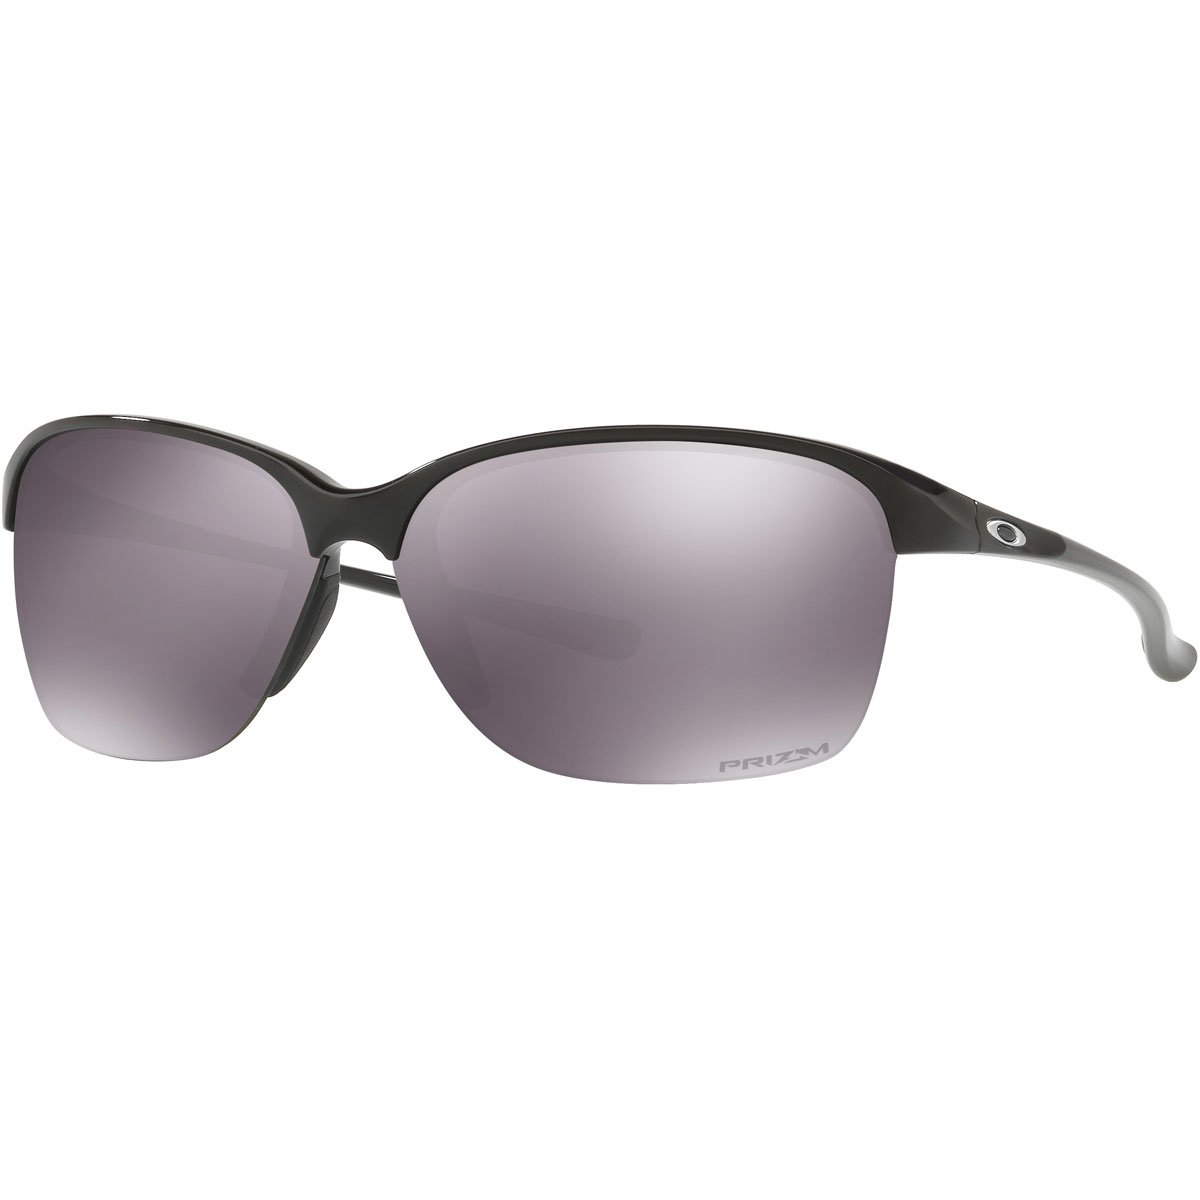 Oakley Women's OO9191 Unstoppable Rectangular Sunglasses, Polished Black/Prizm Black, 65 mm by Oakley